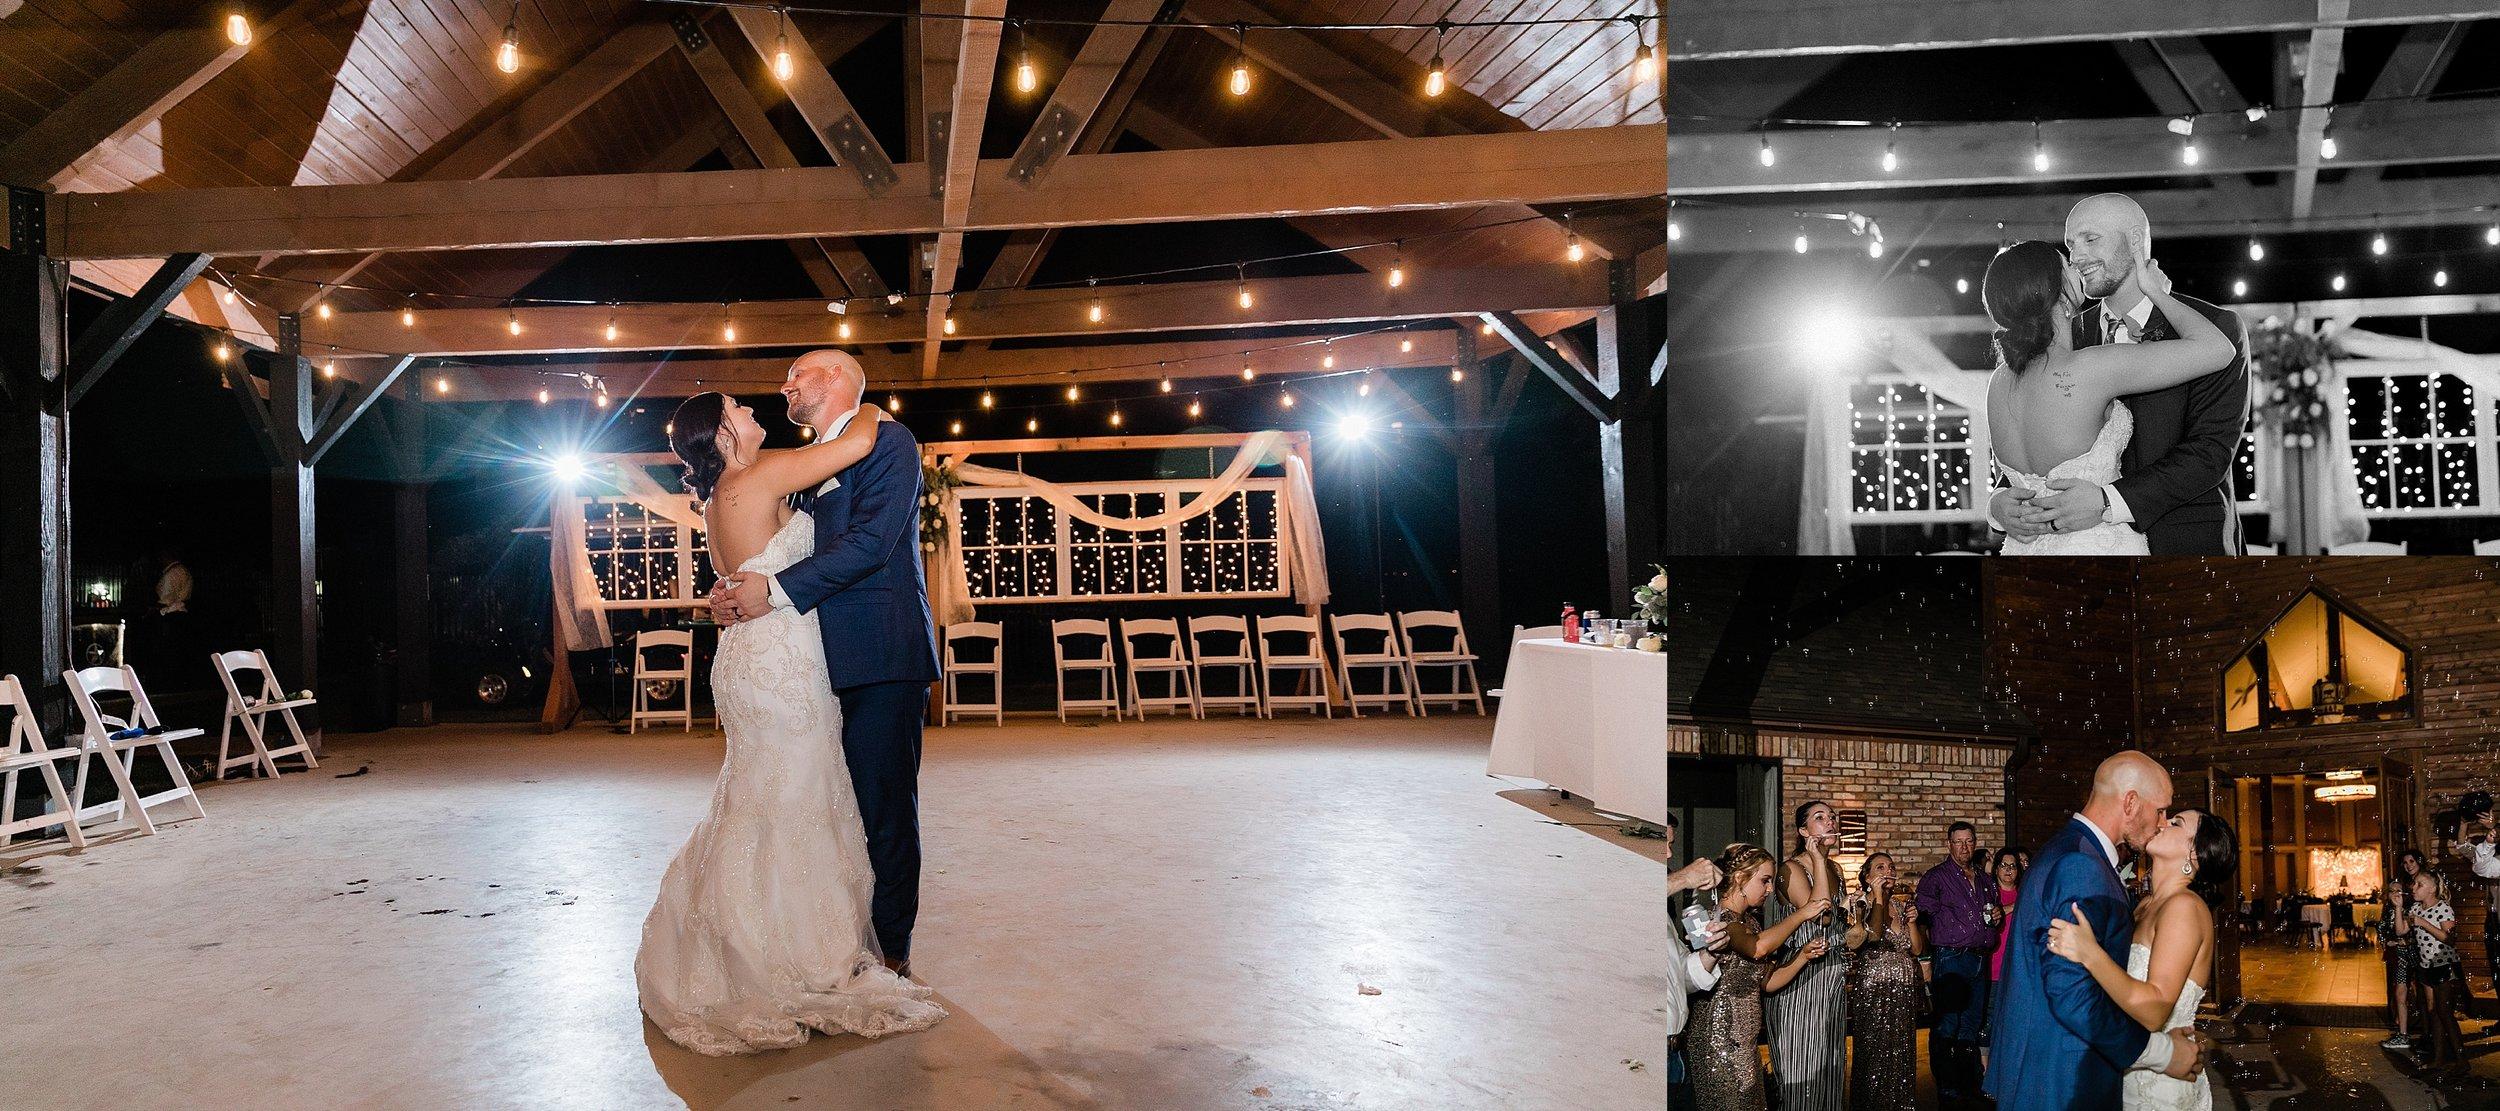 bailey-and-carl-coyote-ranch-resort-wedding-photographer-wichita-falls-texas-destination-wedding-0070.jpg